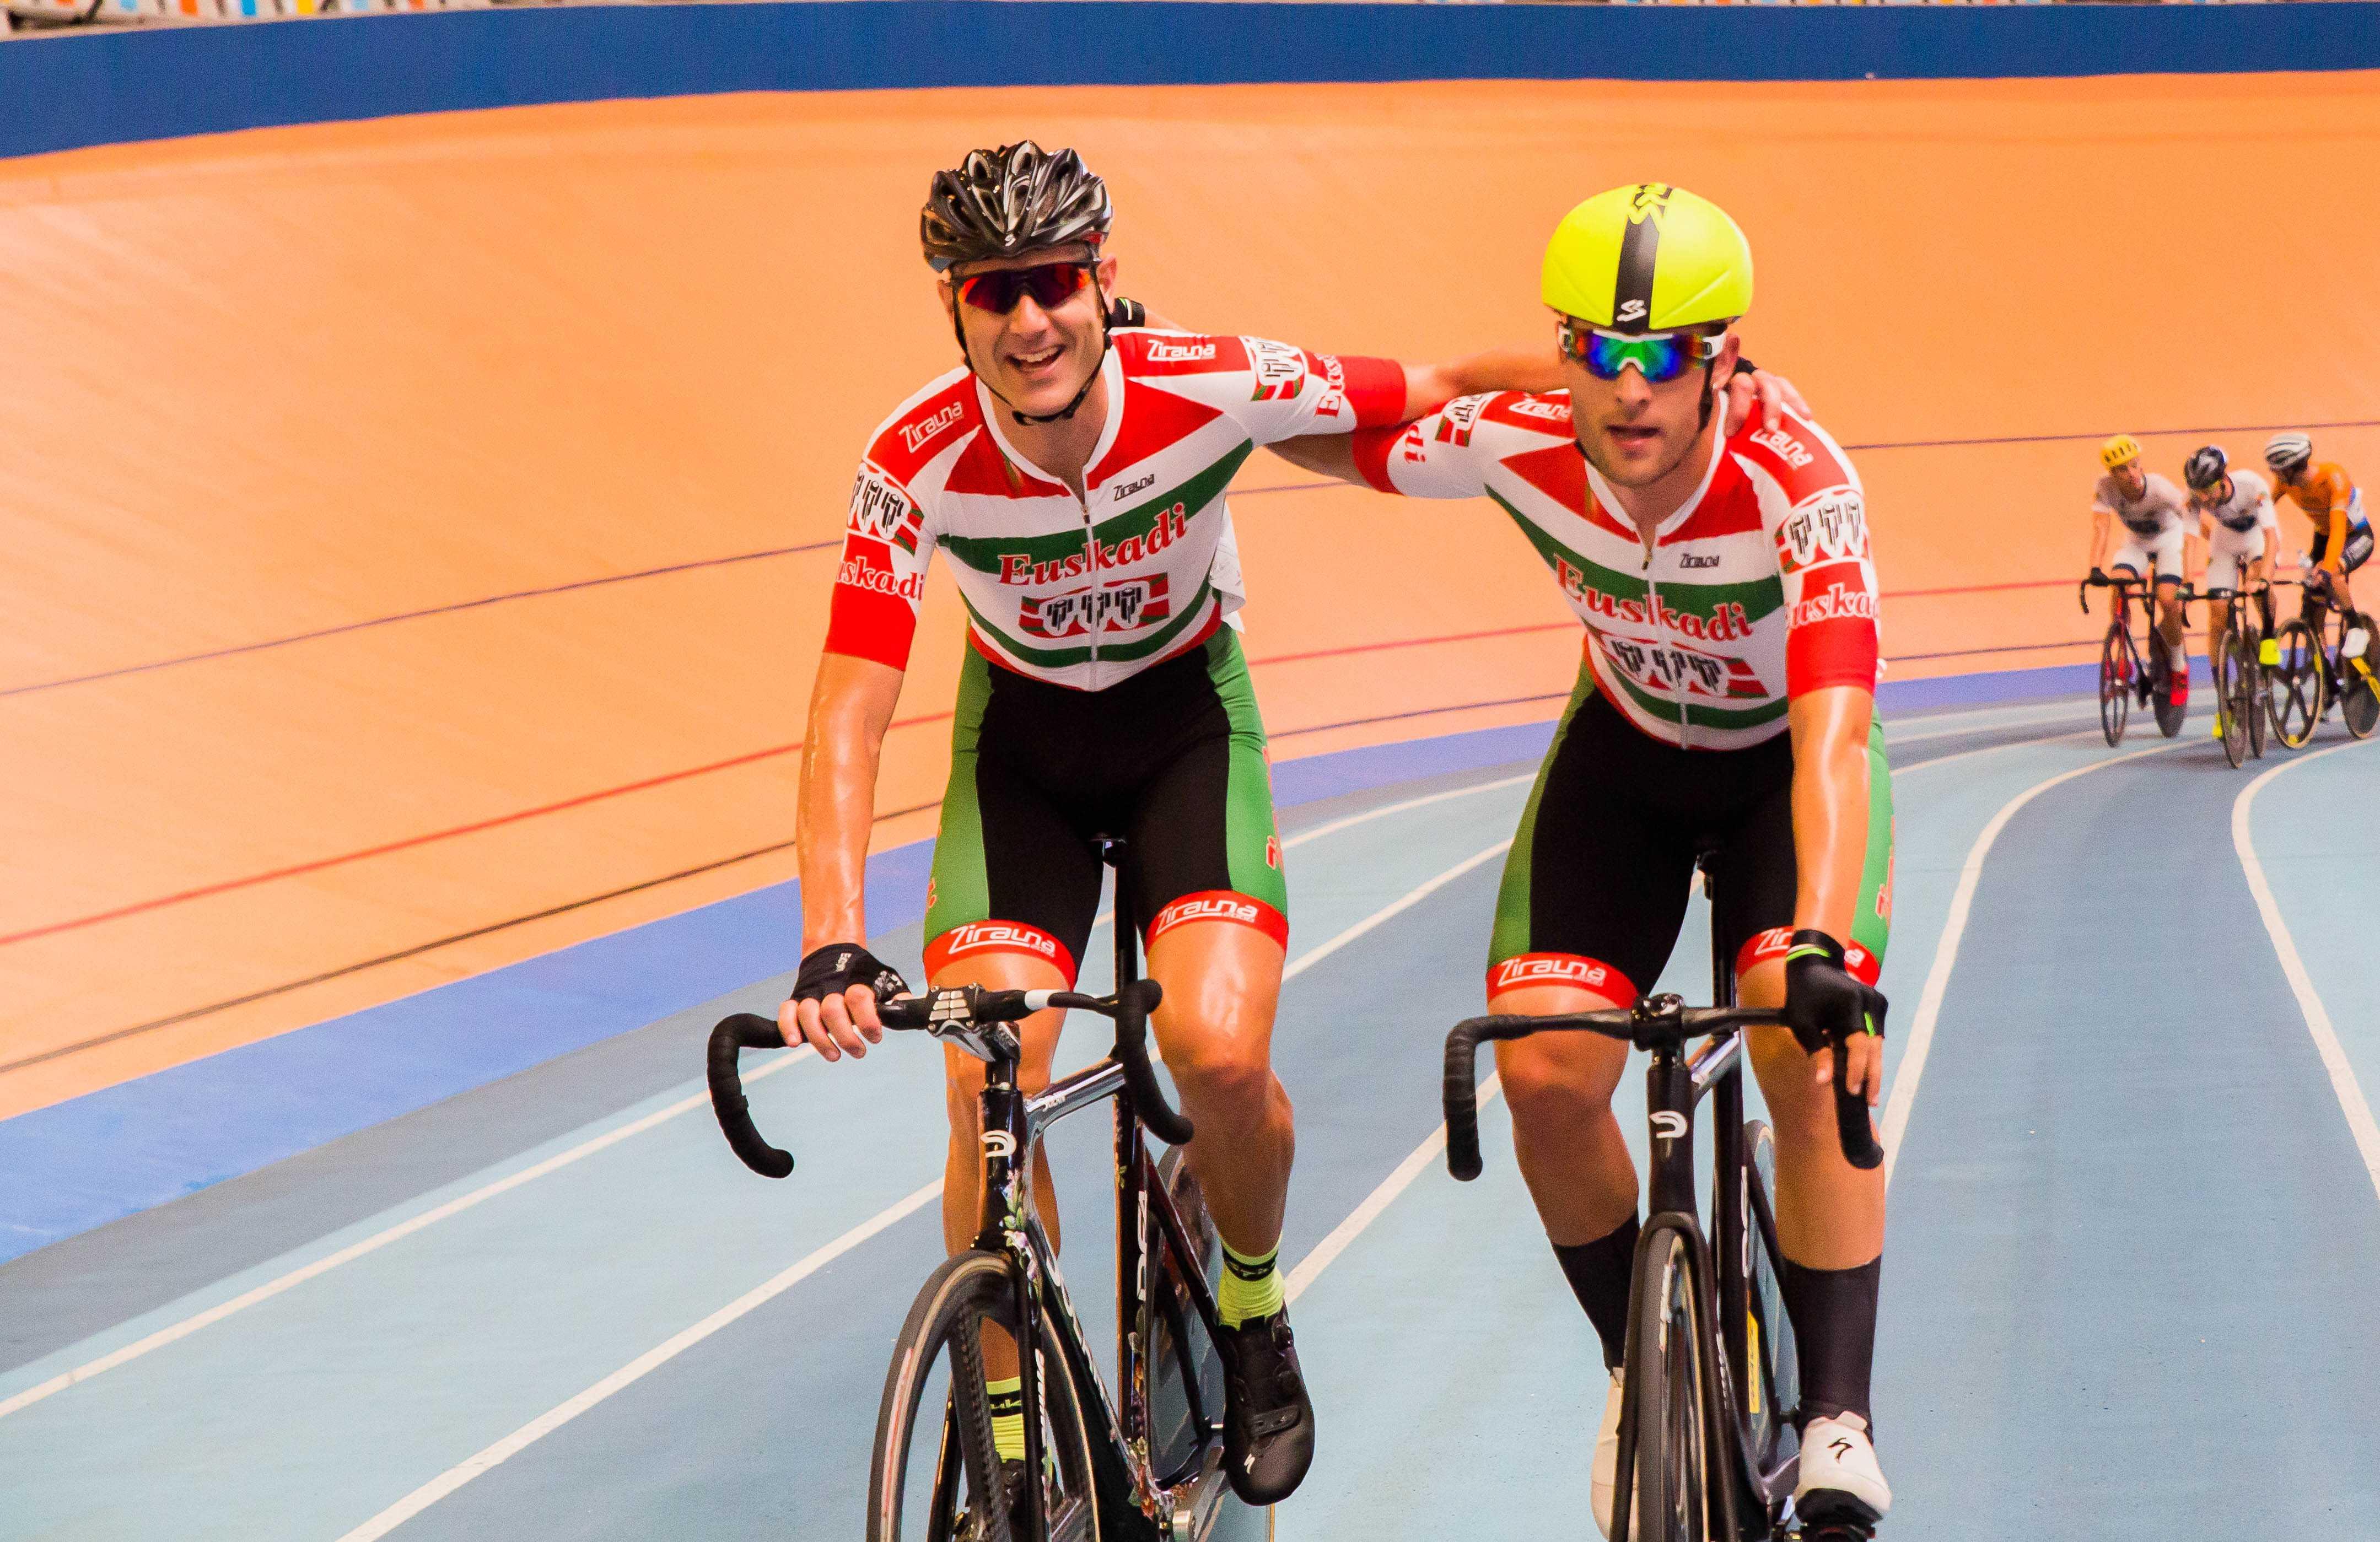 ciclismo pista campeonato españa